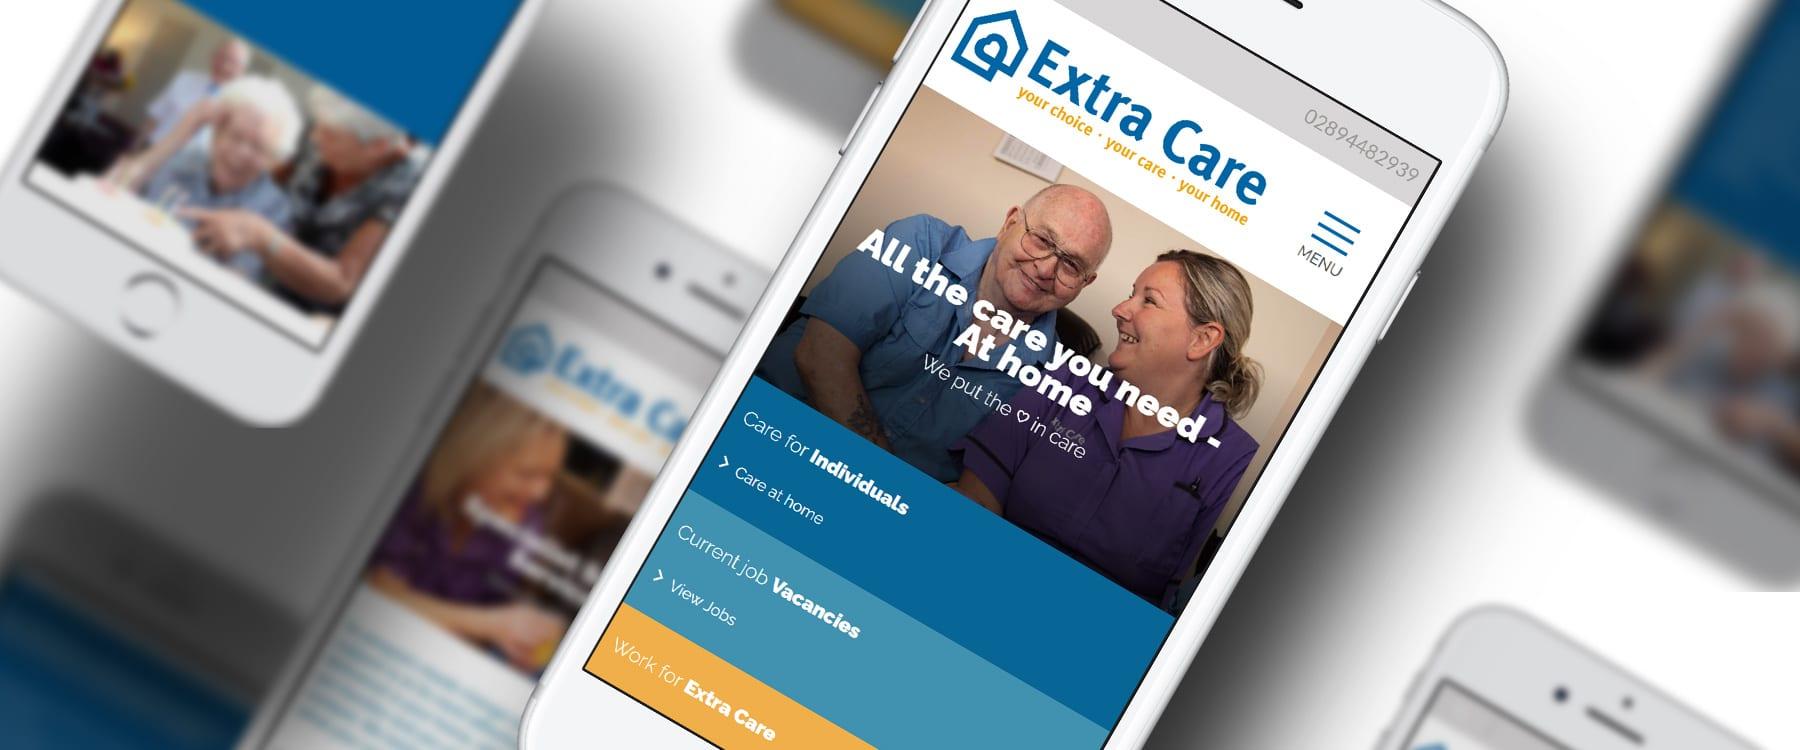 Extra Care Image third